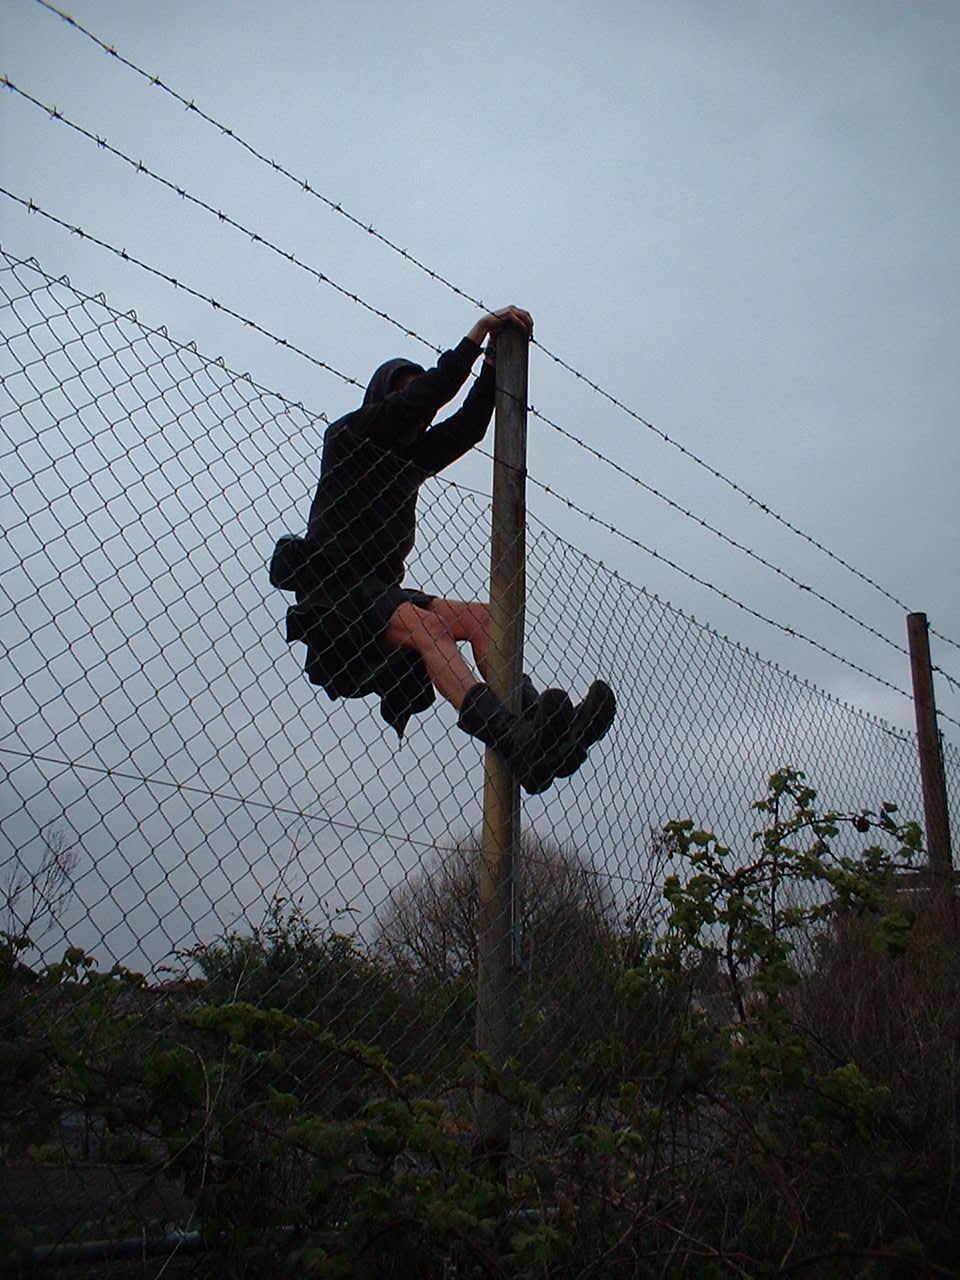 Tour De Fence Bristol United Kingdom Uk